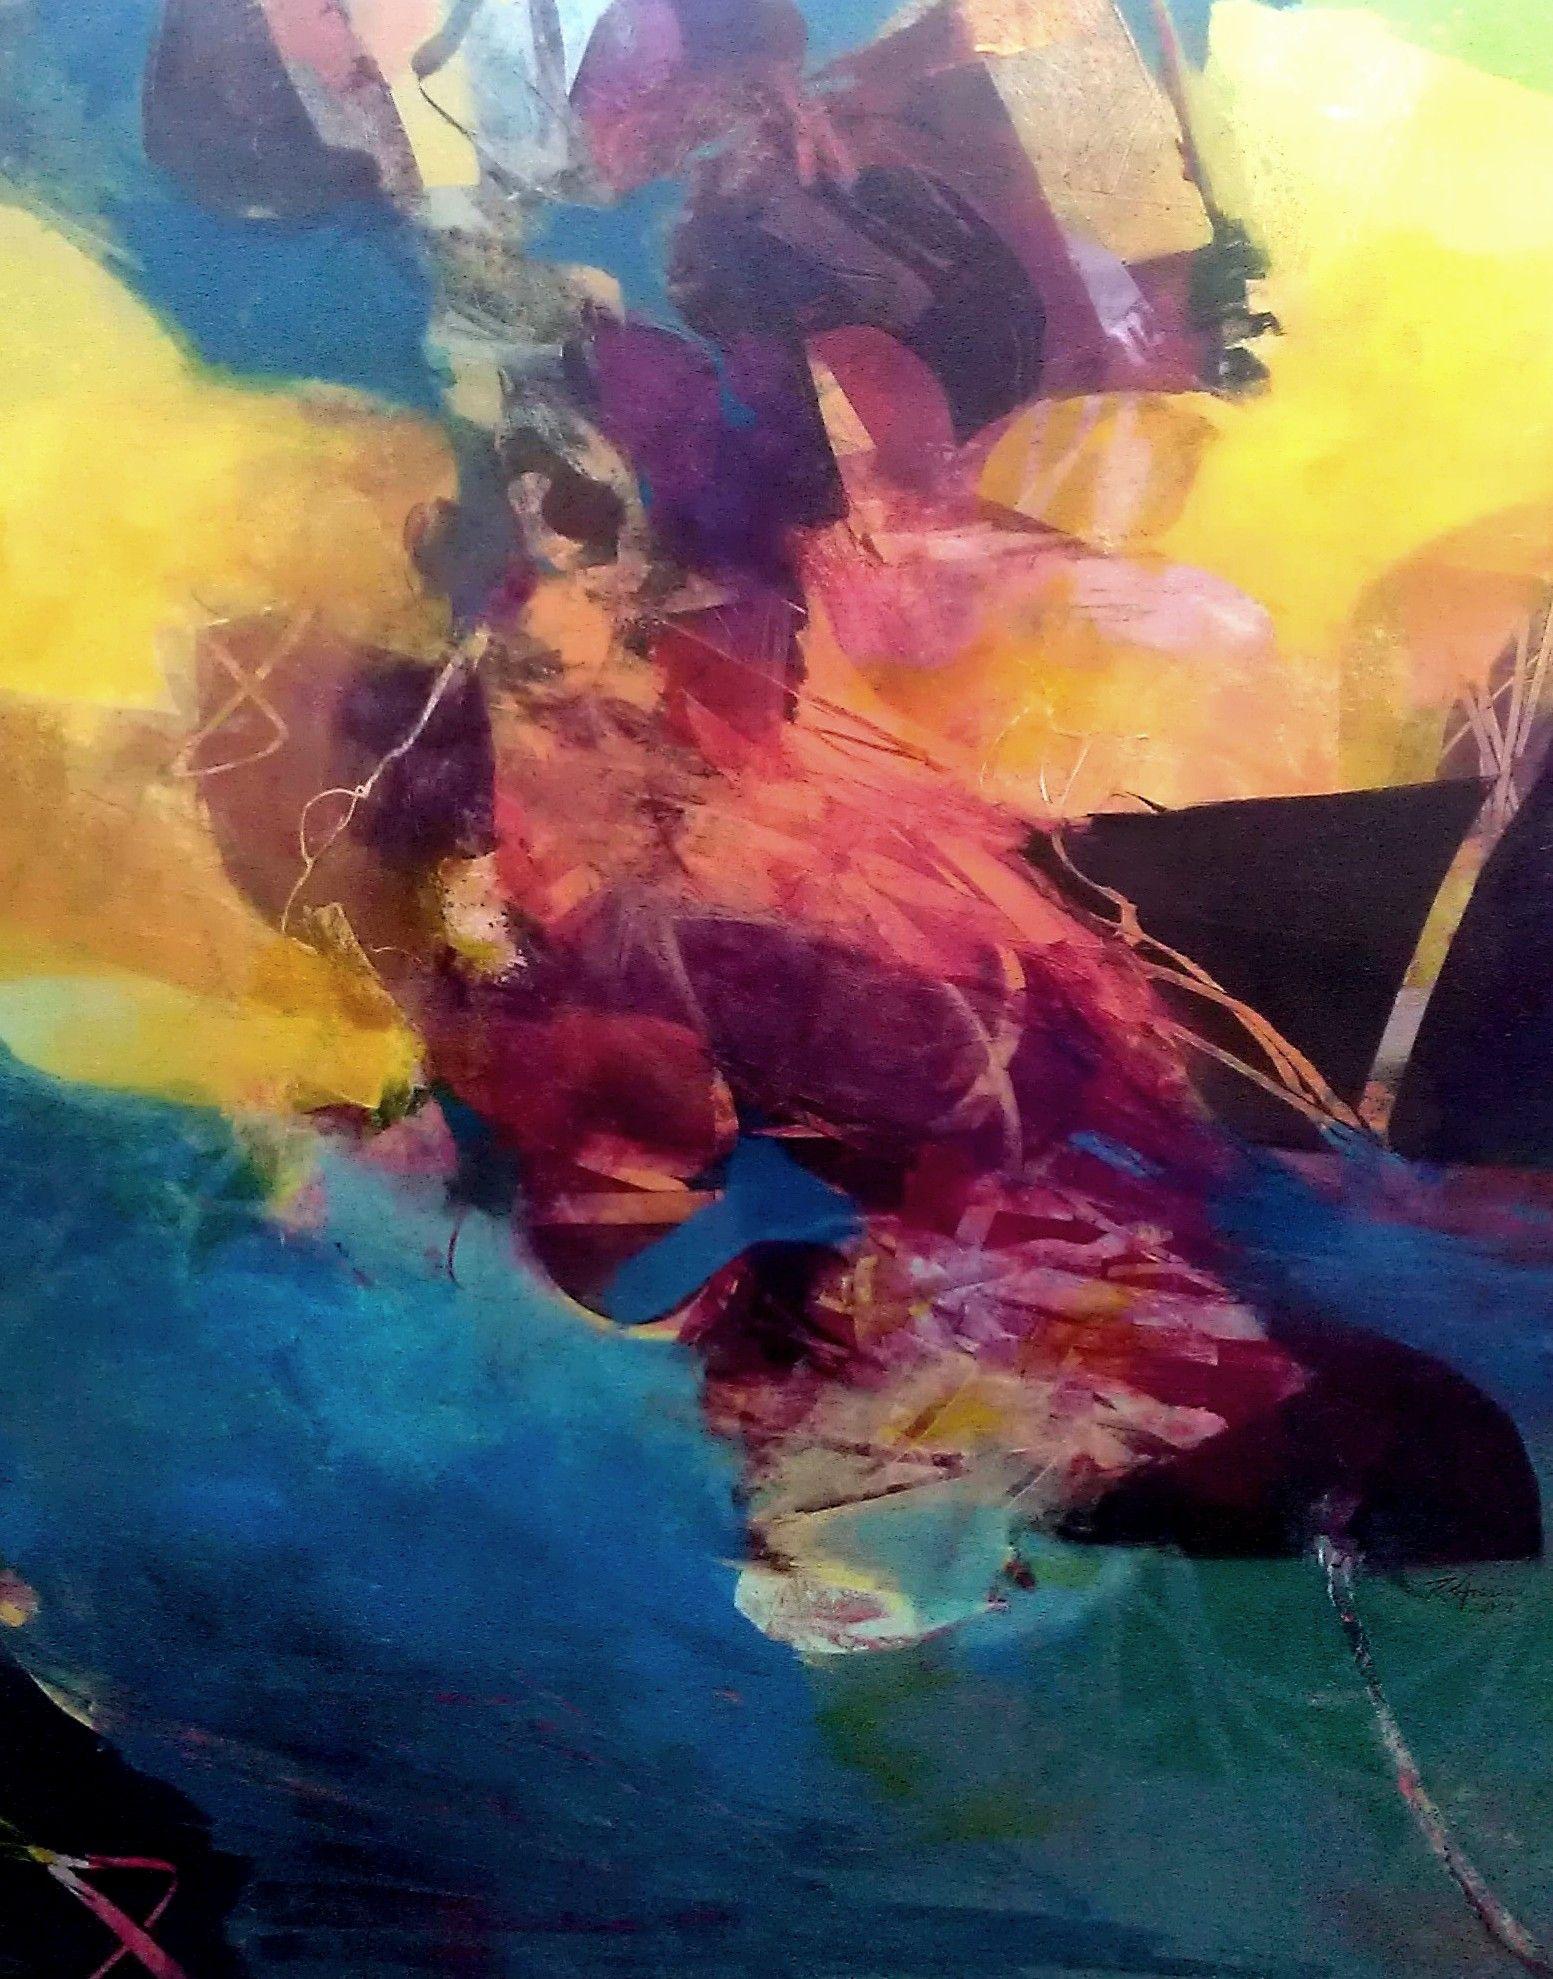 """POOL EDGE"" by Ron Gordon, acrylic on panel."